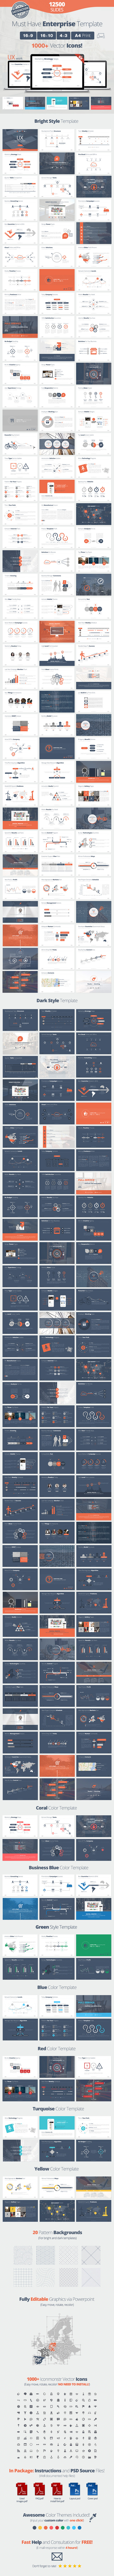 UX Enterprise Powerpoint Presentation Template - Business PowerPoint Templates